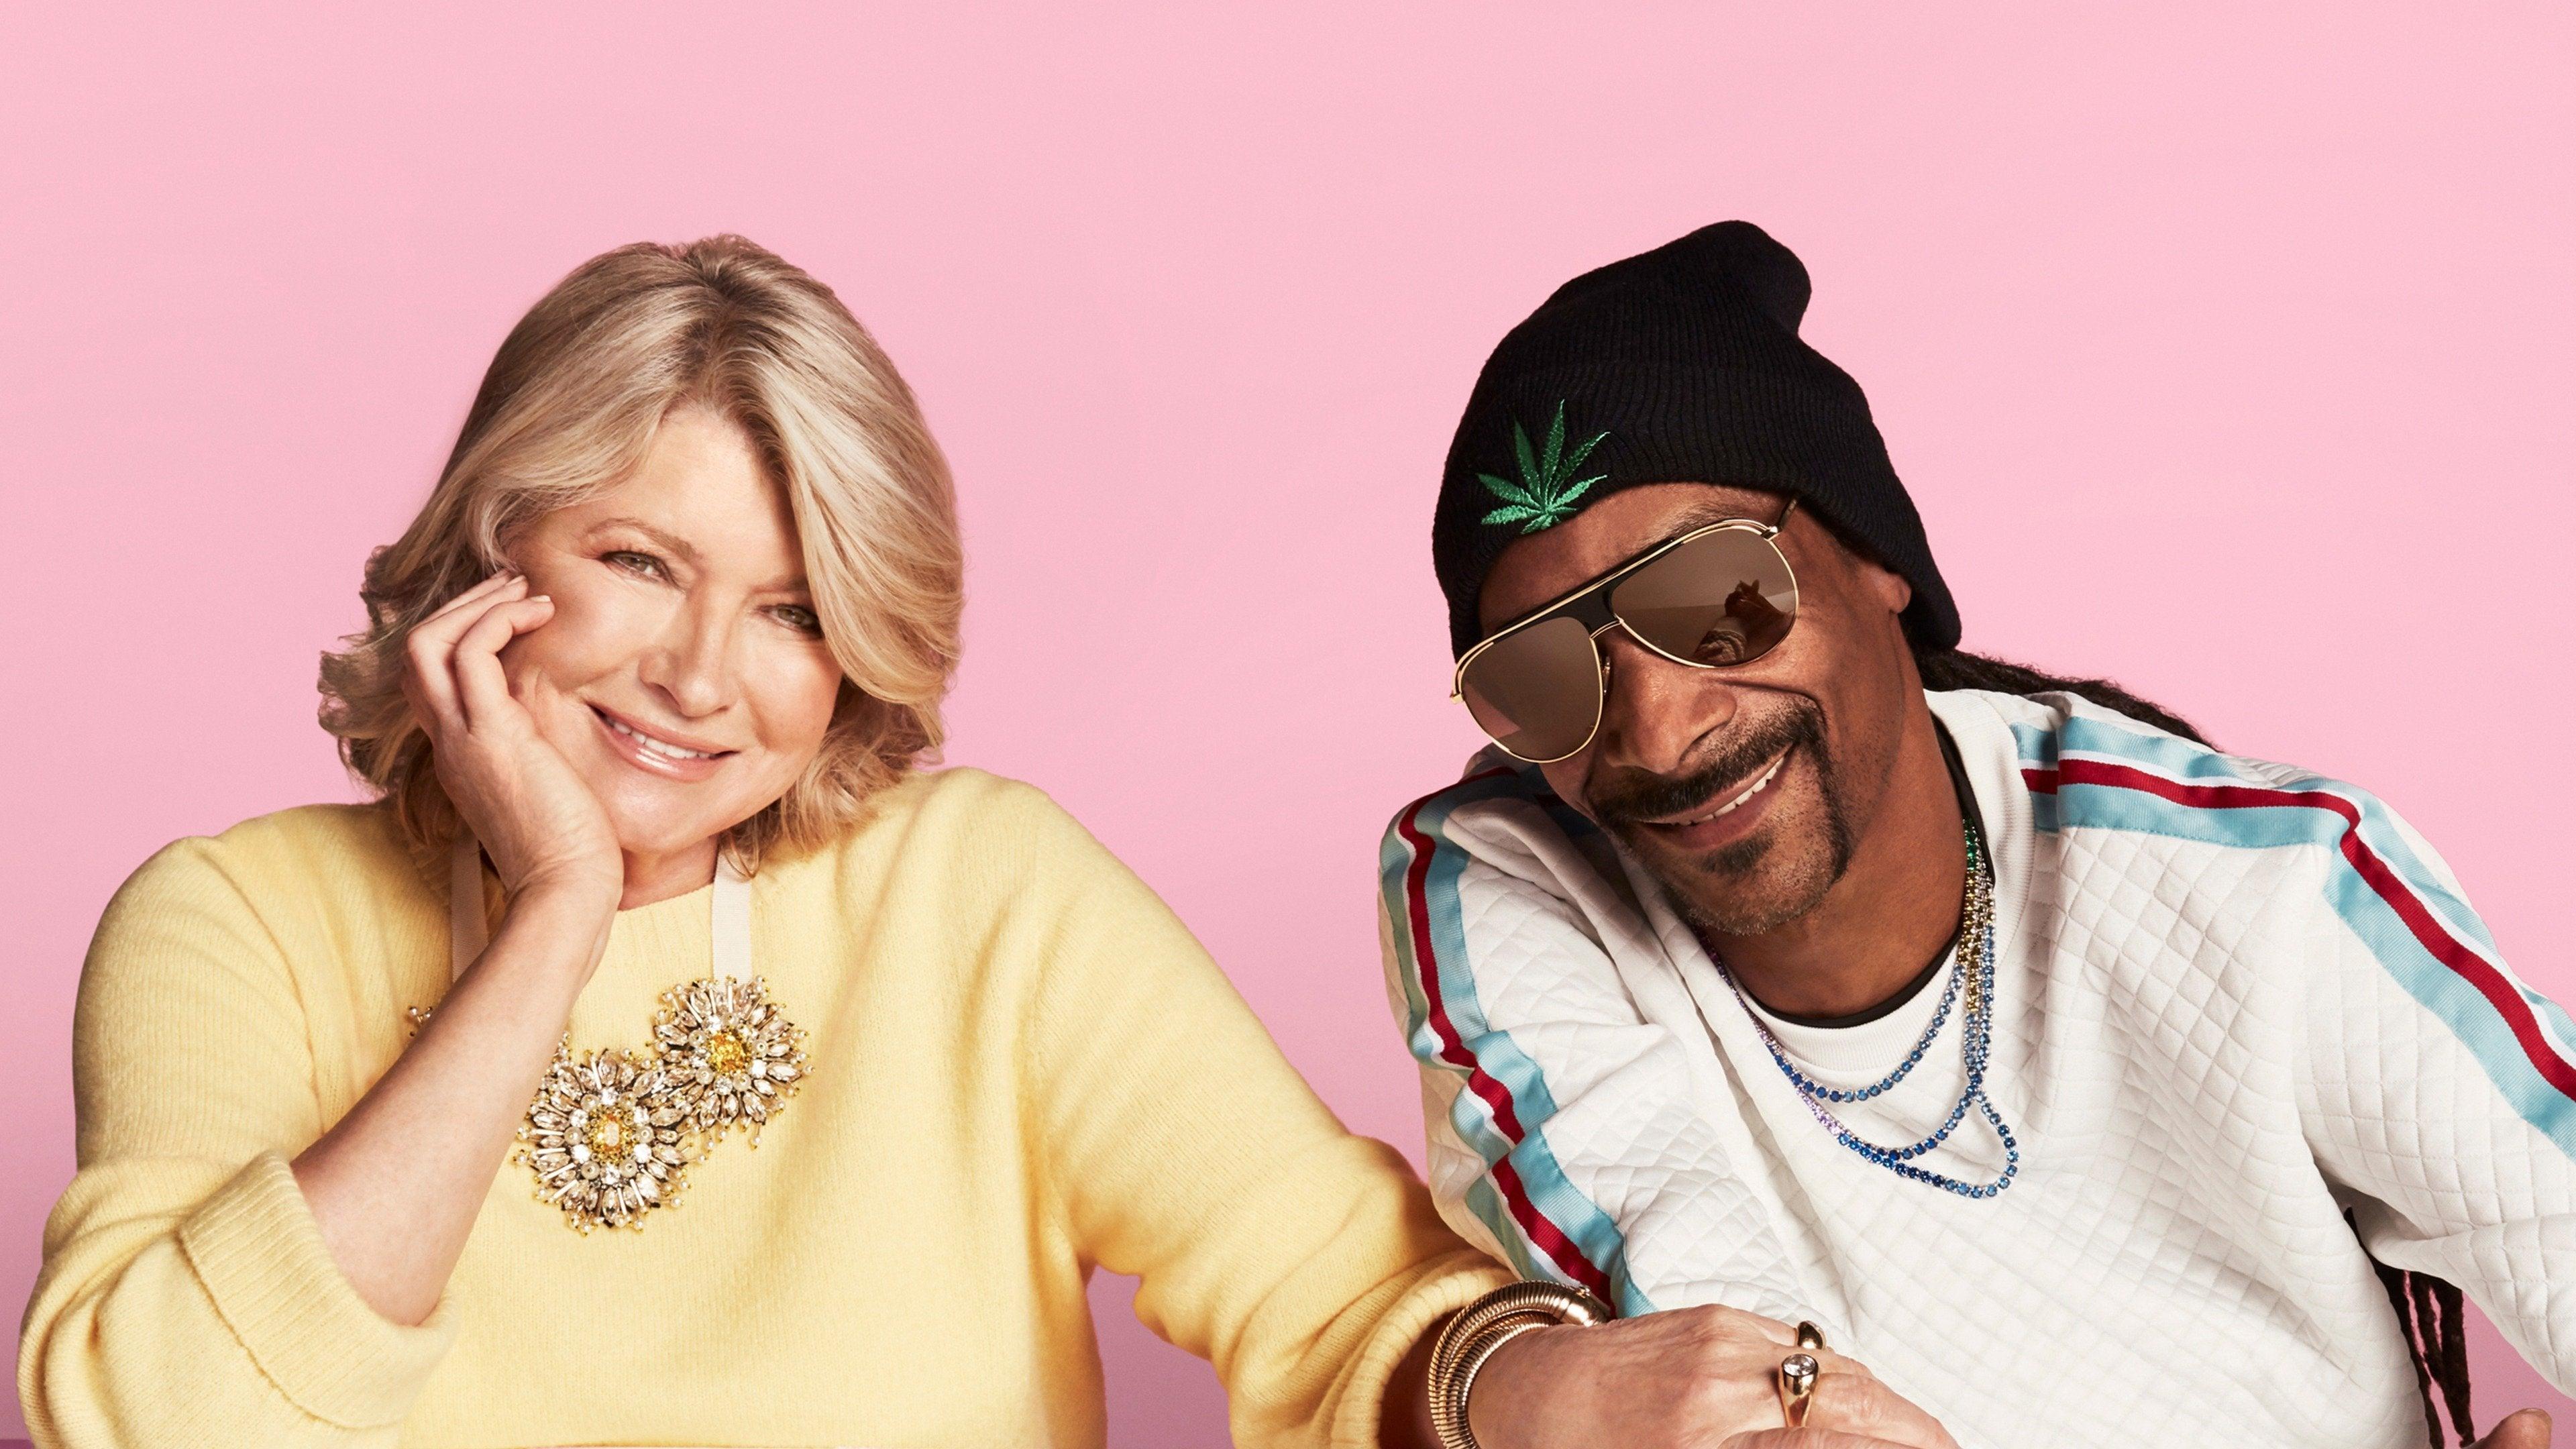 Martha & Snoop's Potluck Party Challenge